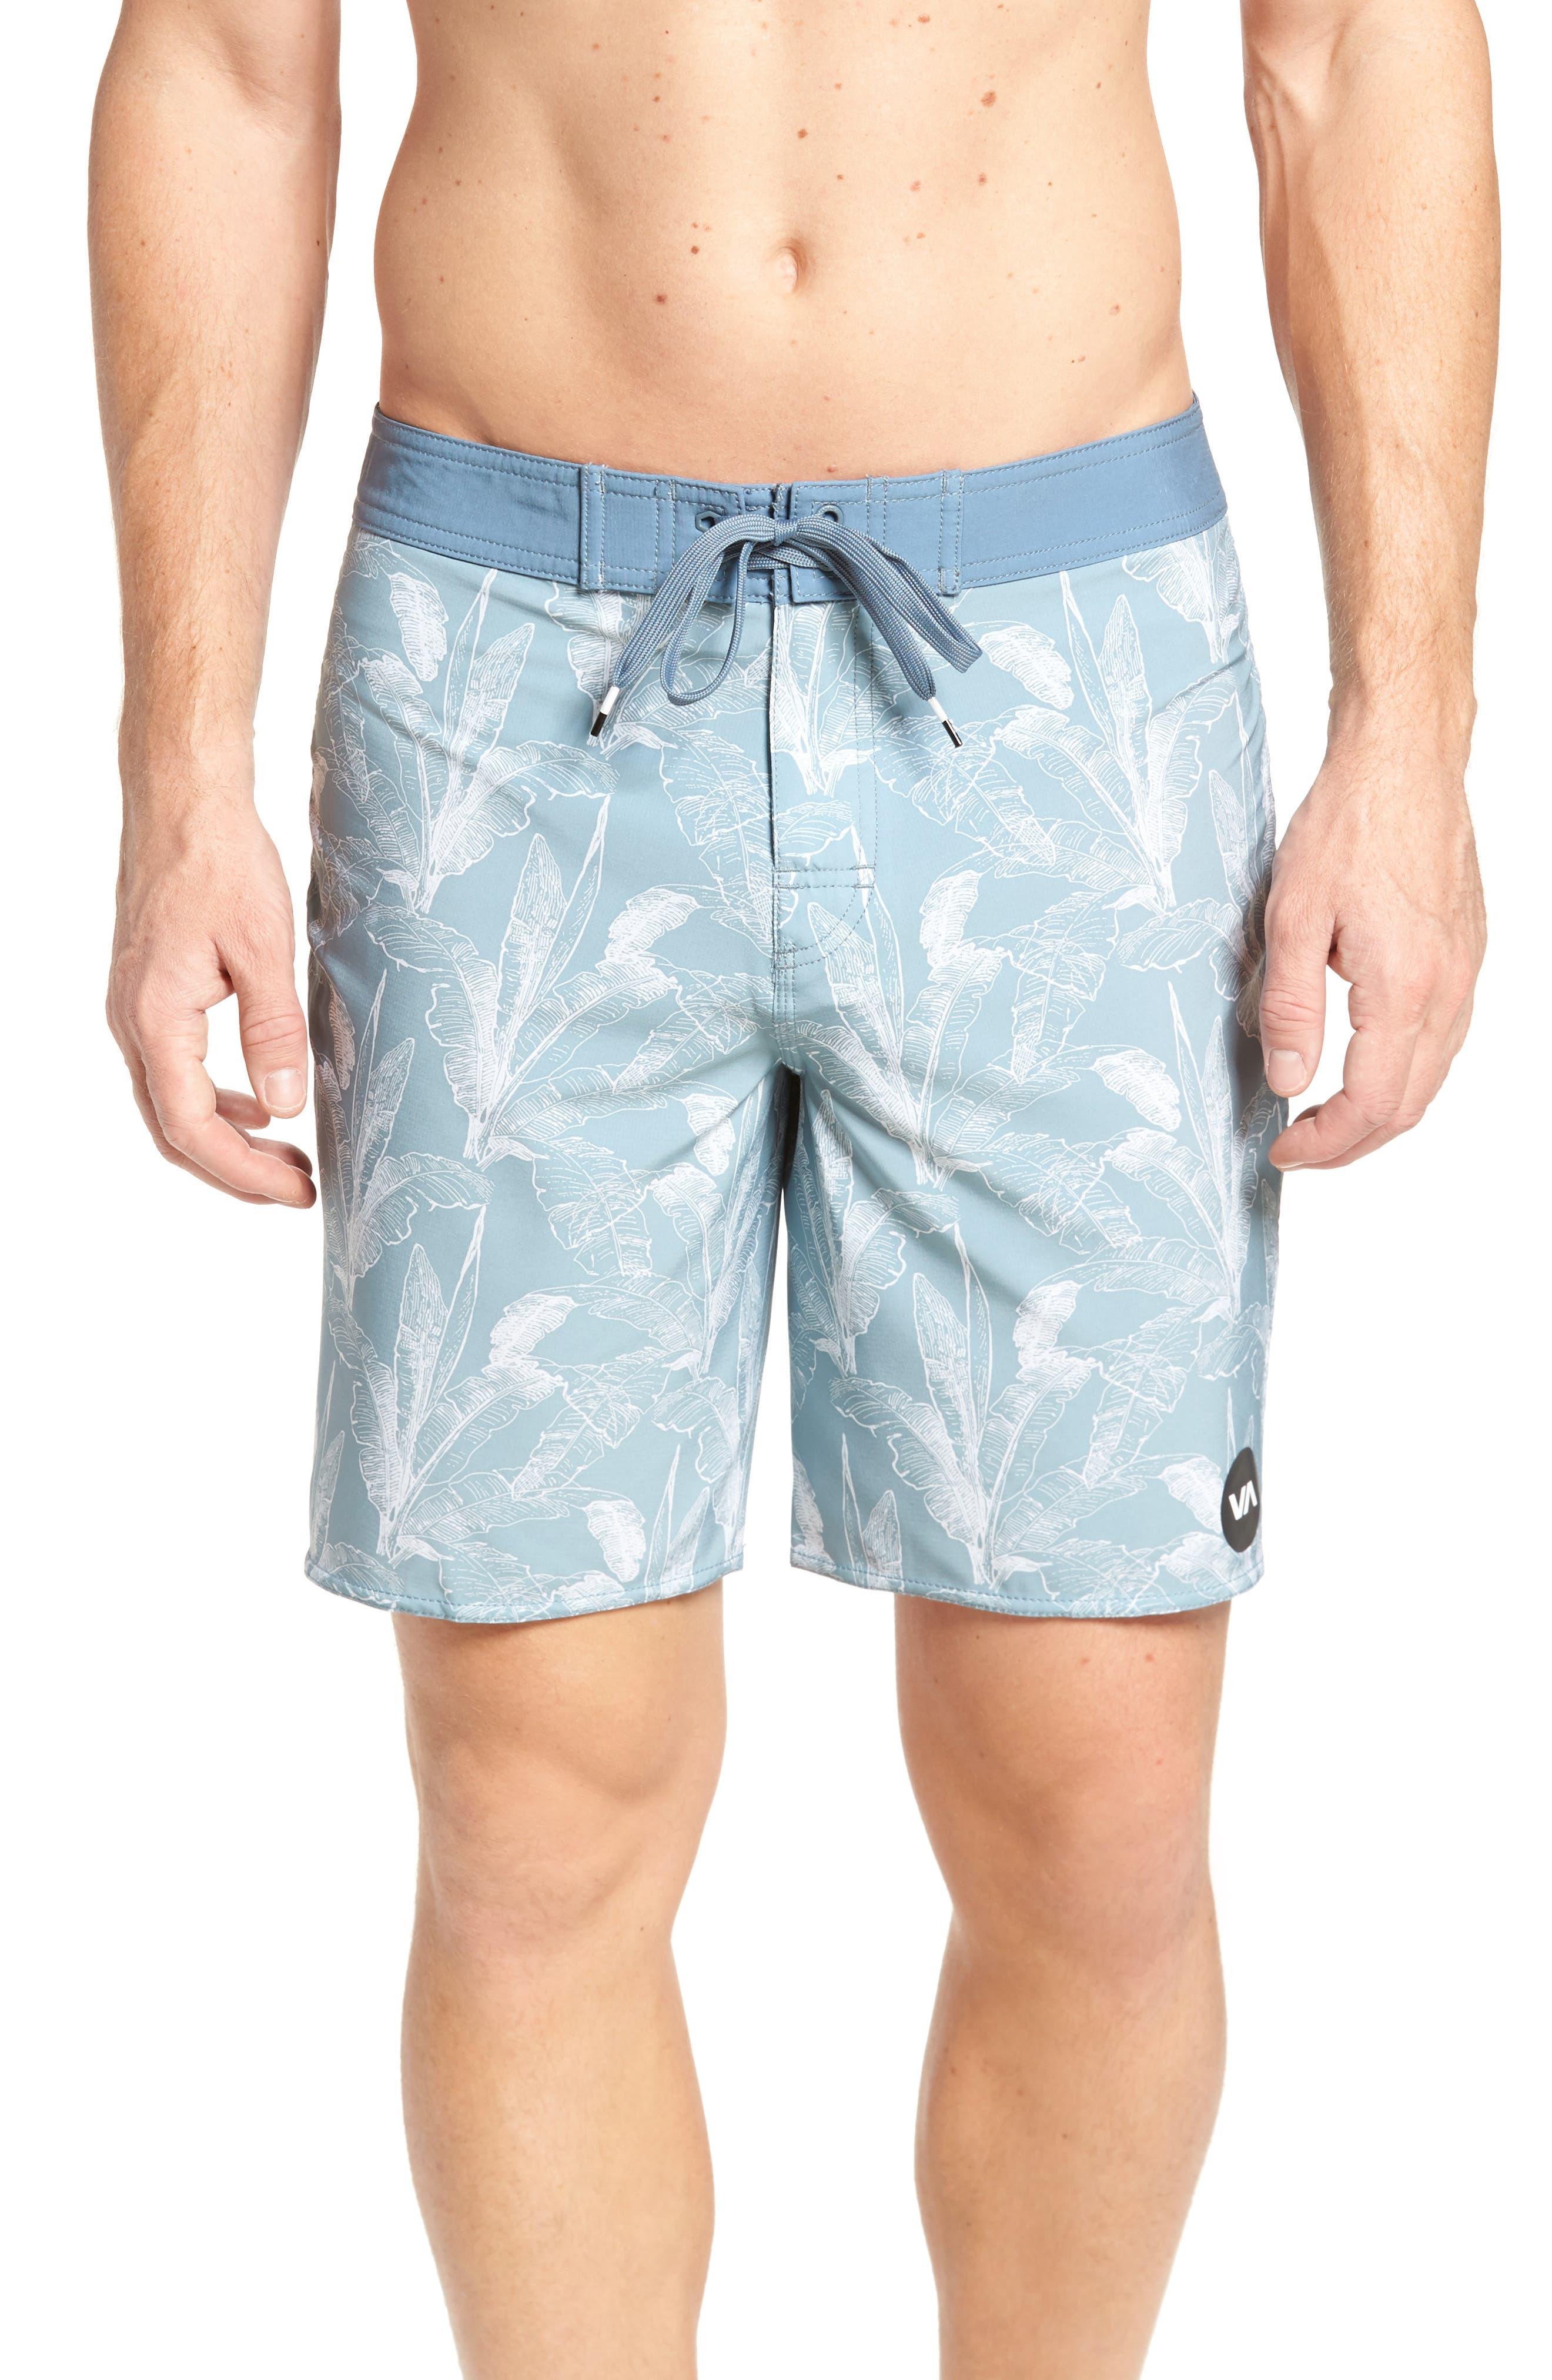 Mirage Print Board Shorts,                         Main,                         color, Arona Blue